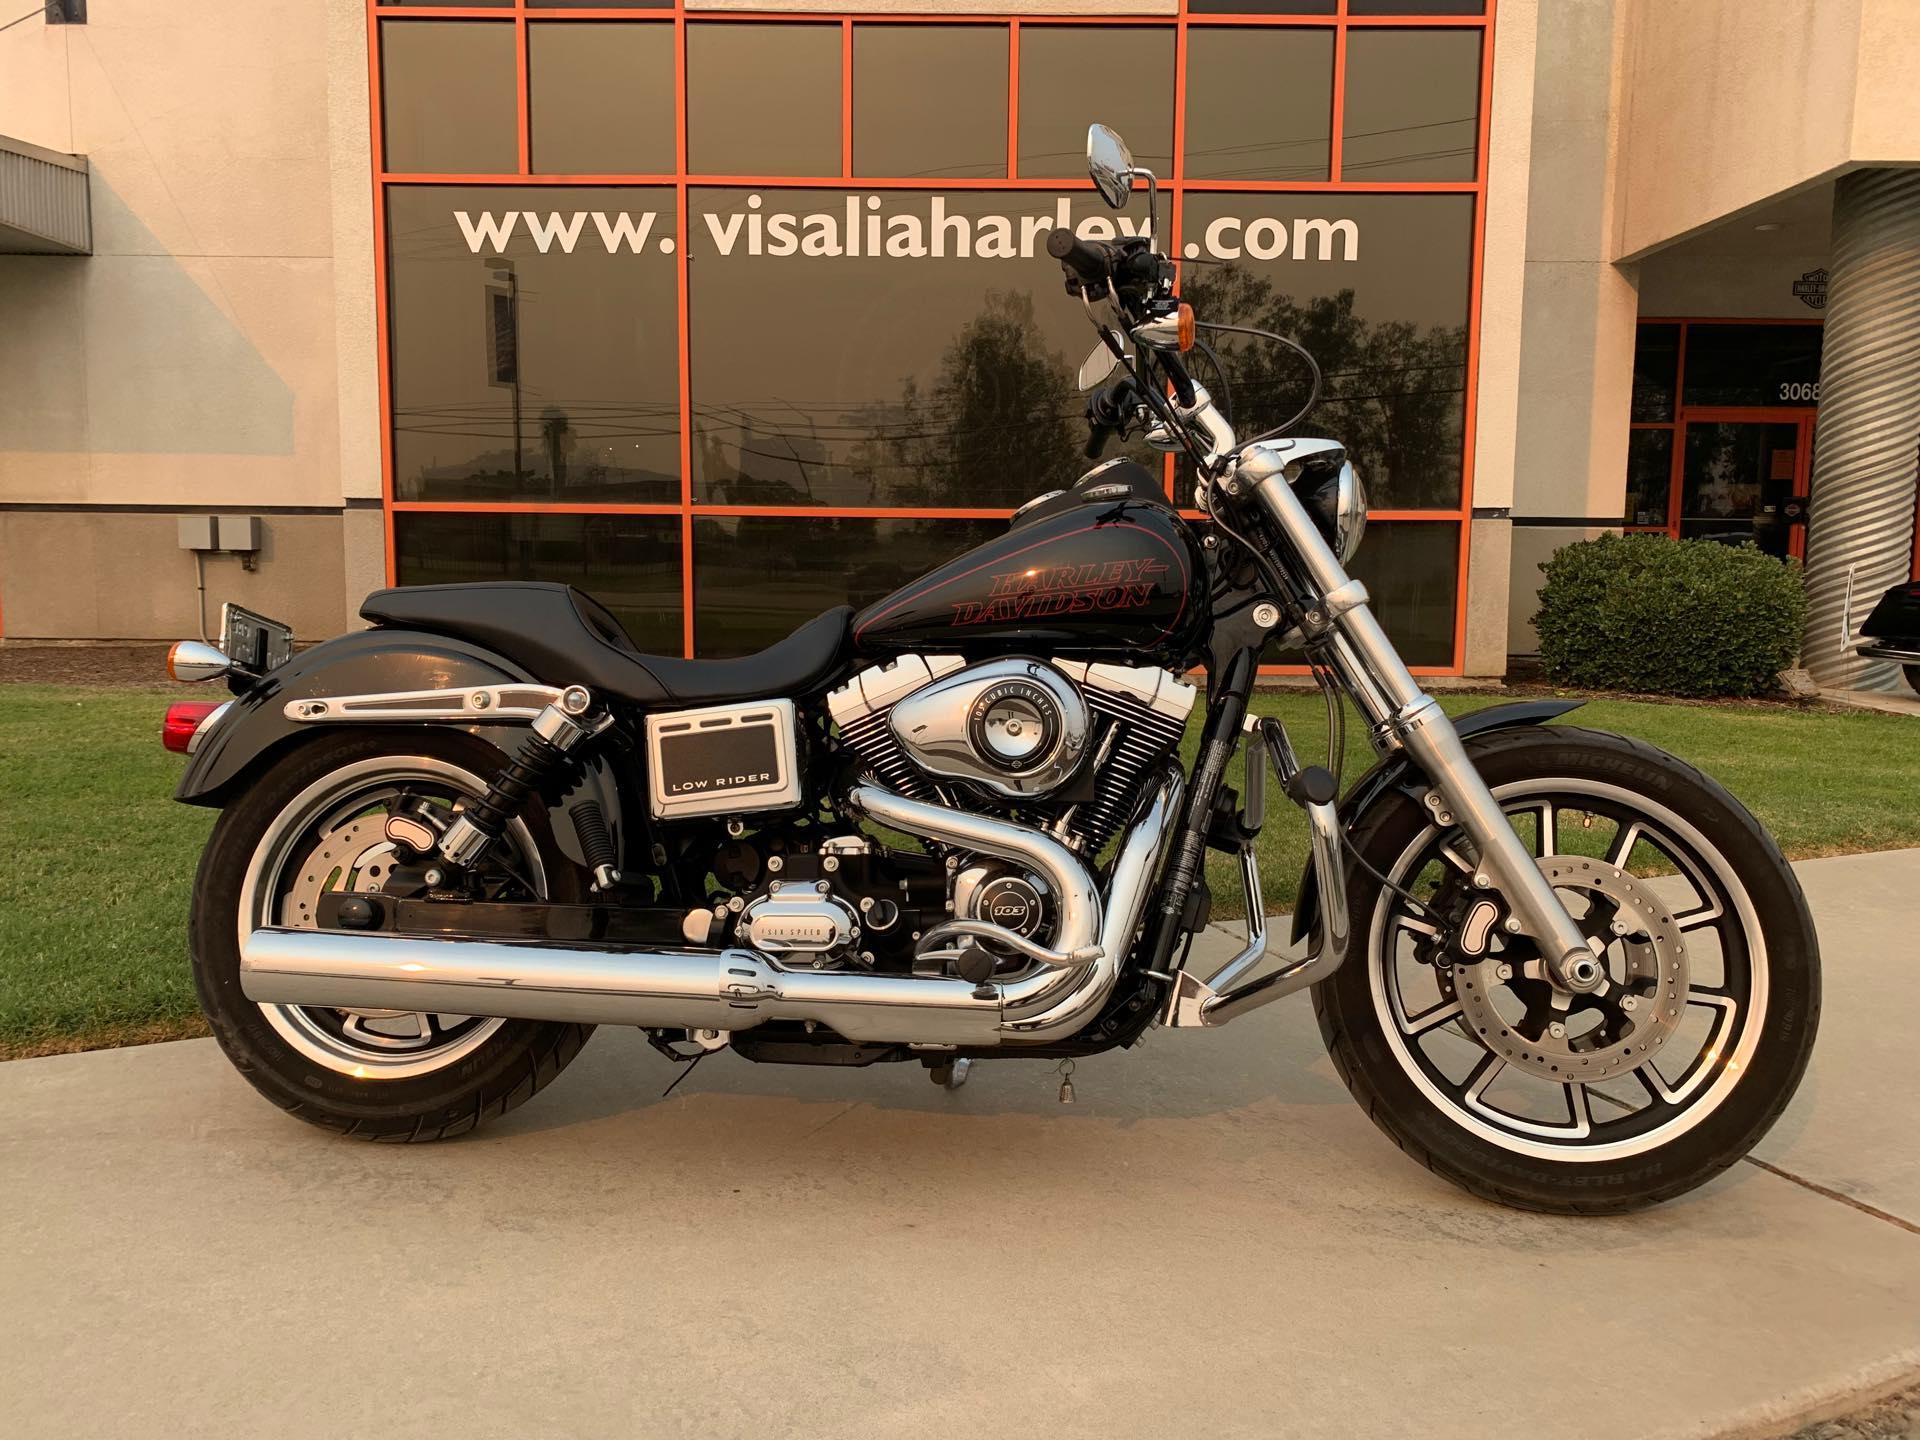 2014 Harley-Davidson Dyna Low Rider at Visalia Harley-Davidson